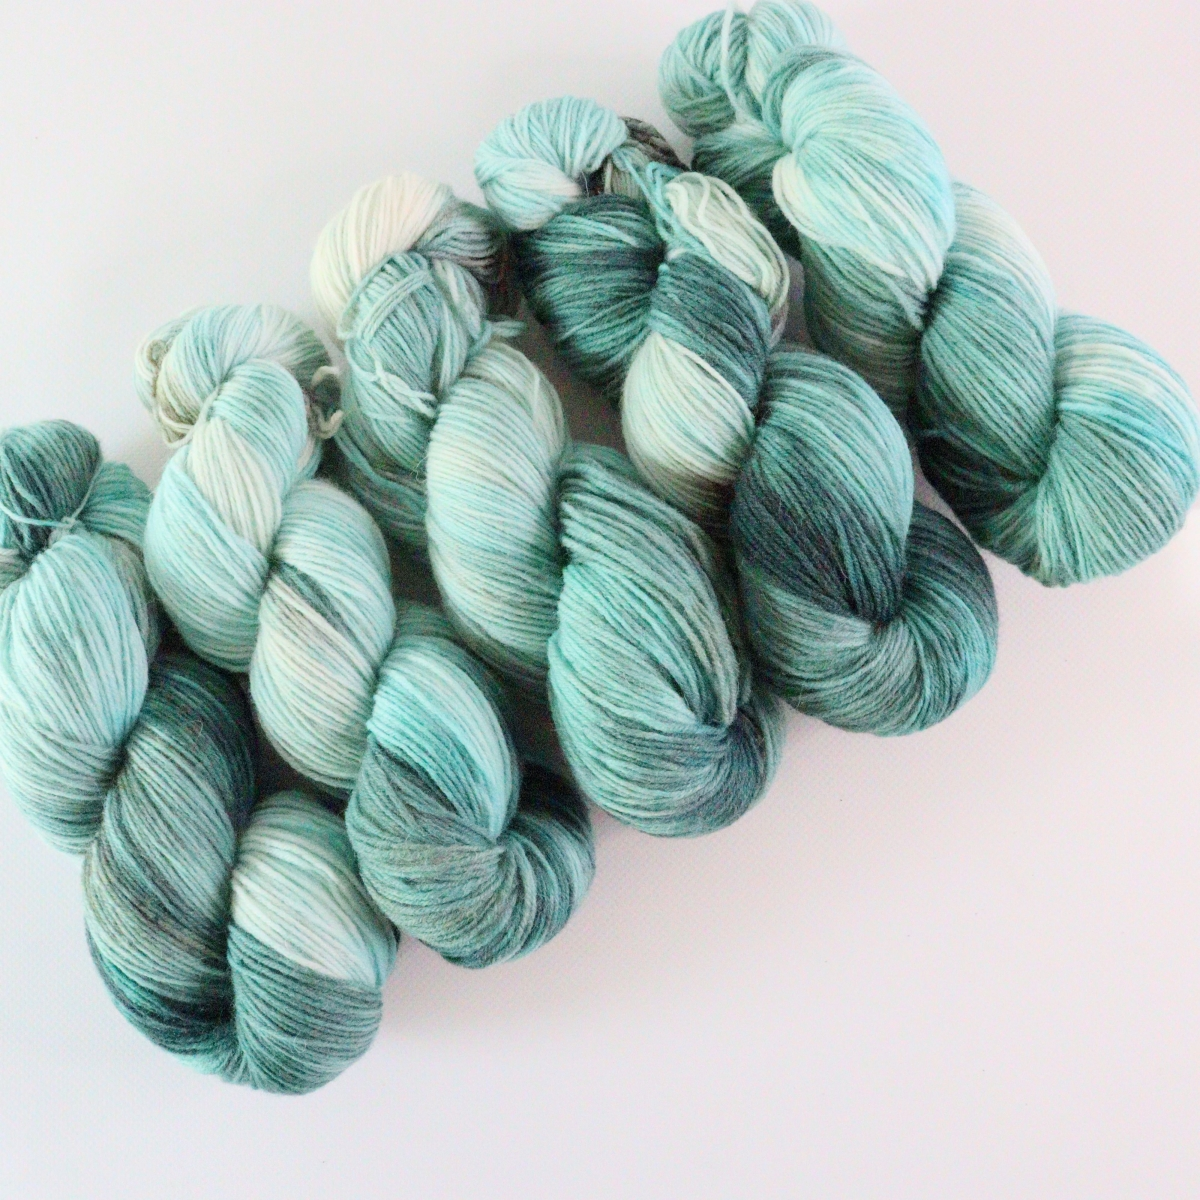 woodico.pro hand dyed yarn 074 3 1200x1200 - Hand dyed yarn / 074